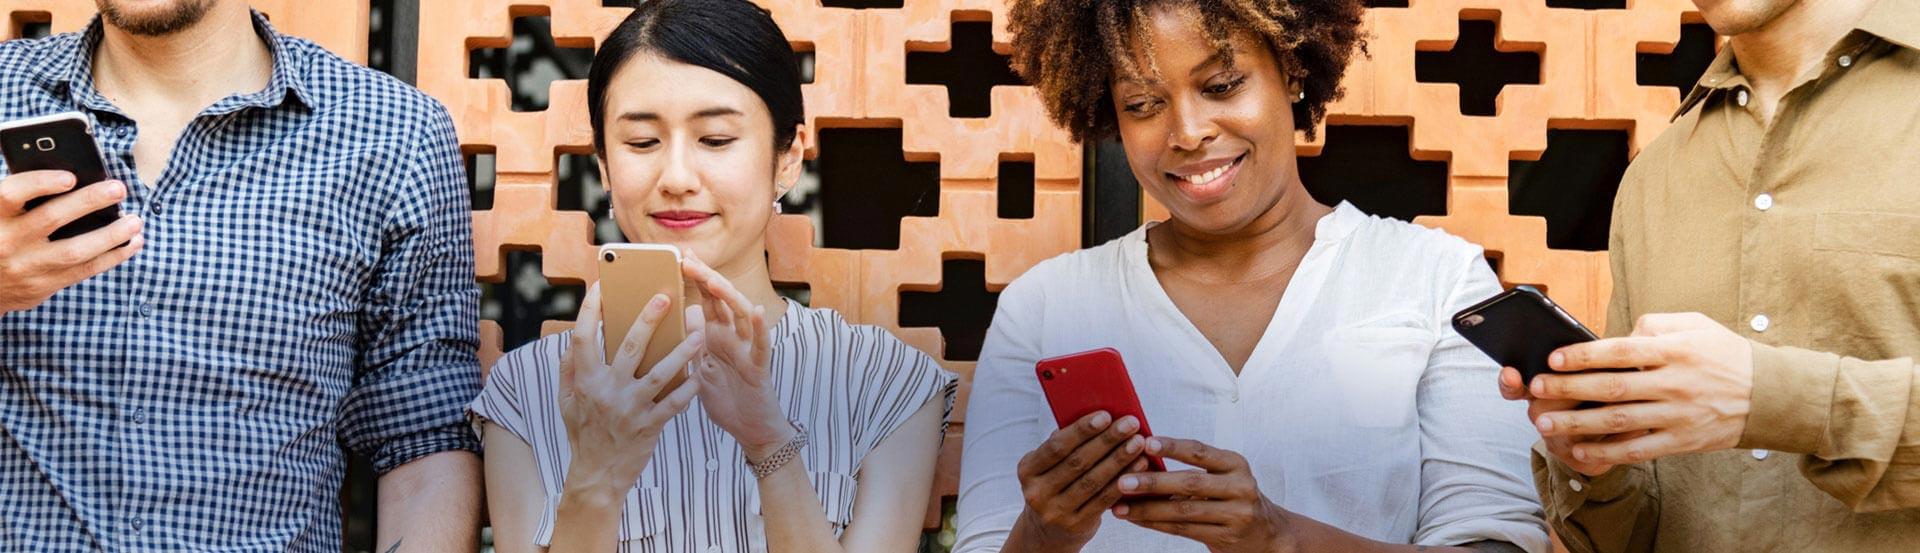 Survey software, CRM connected questionnaire software